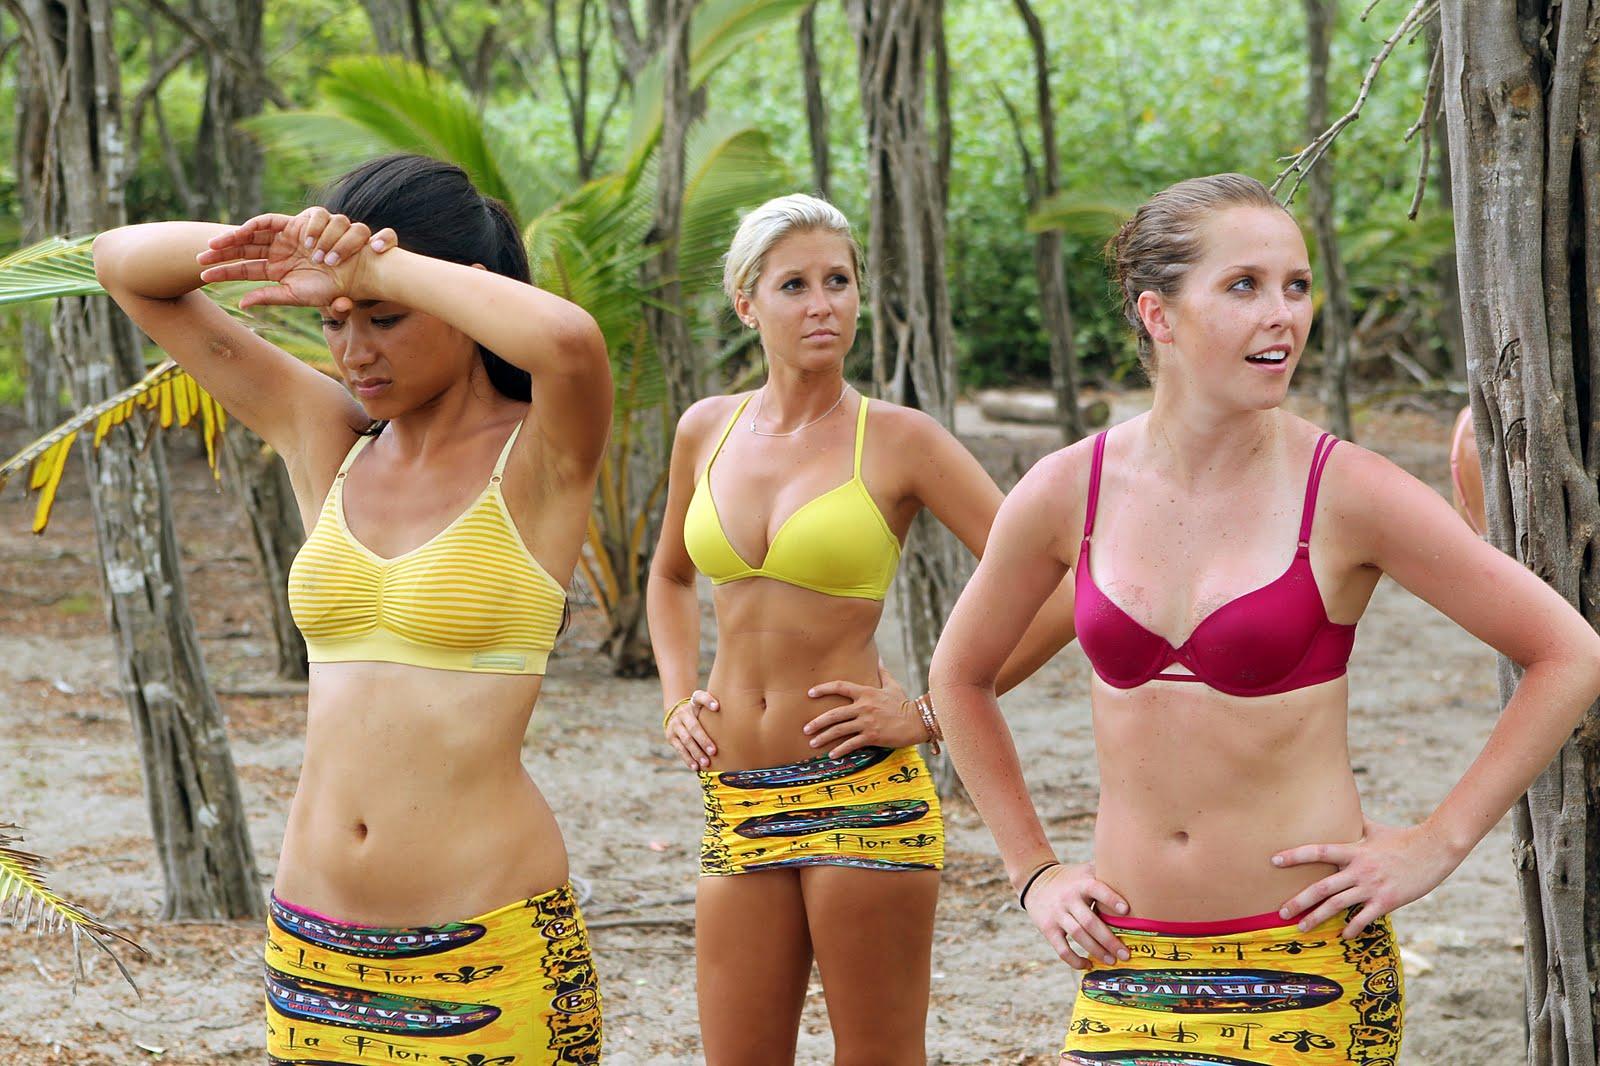 http://3.bp.blogspot.com/_RfV5VMtlSWQ/TJqm_ImivbI/AAAAAAAADHs/i3tH3g9aoYU/s1600/Survivor+Girls.jpg